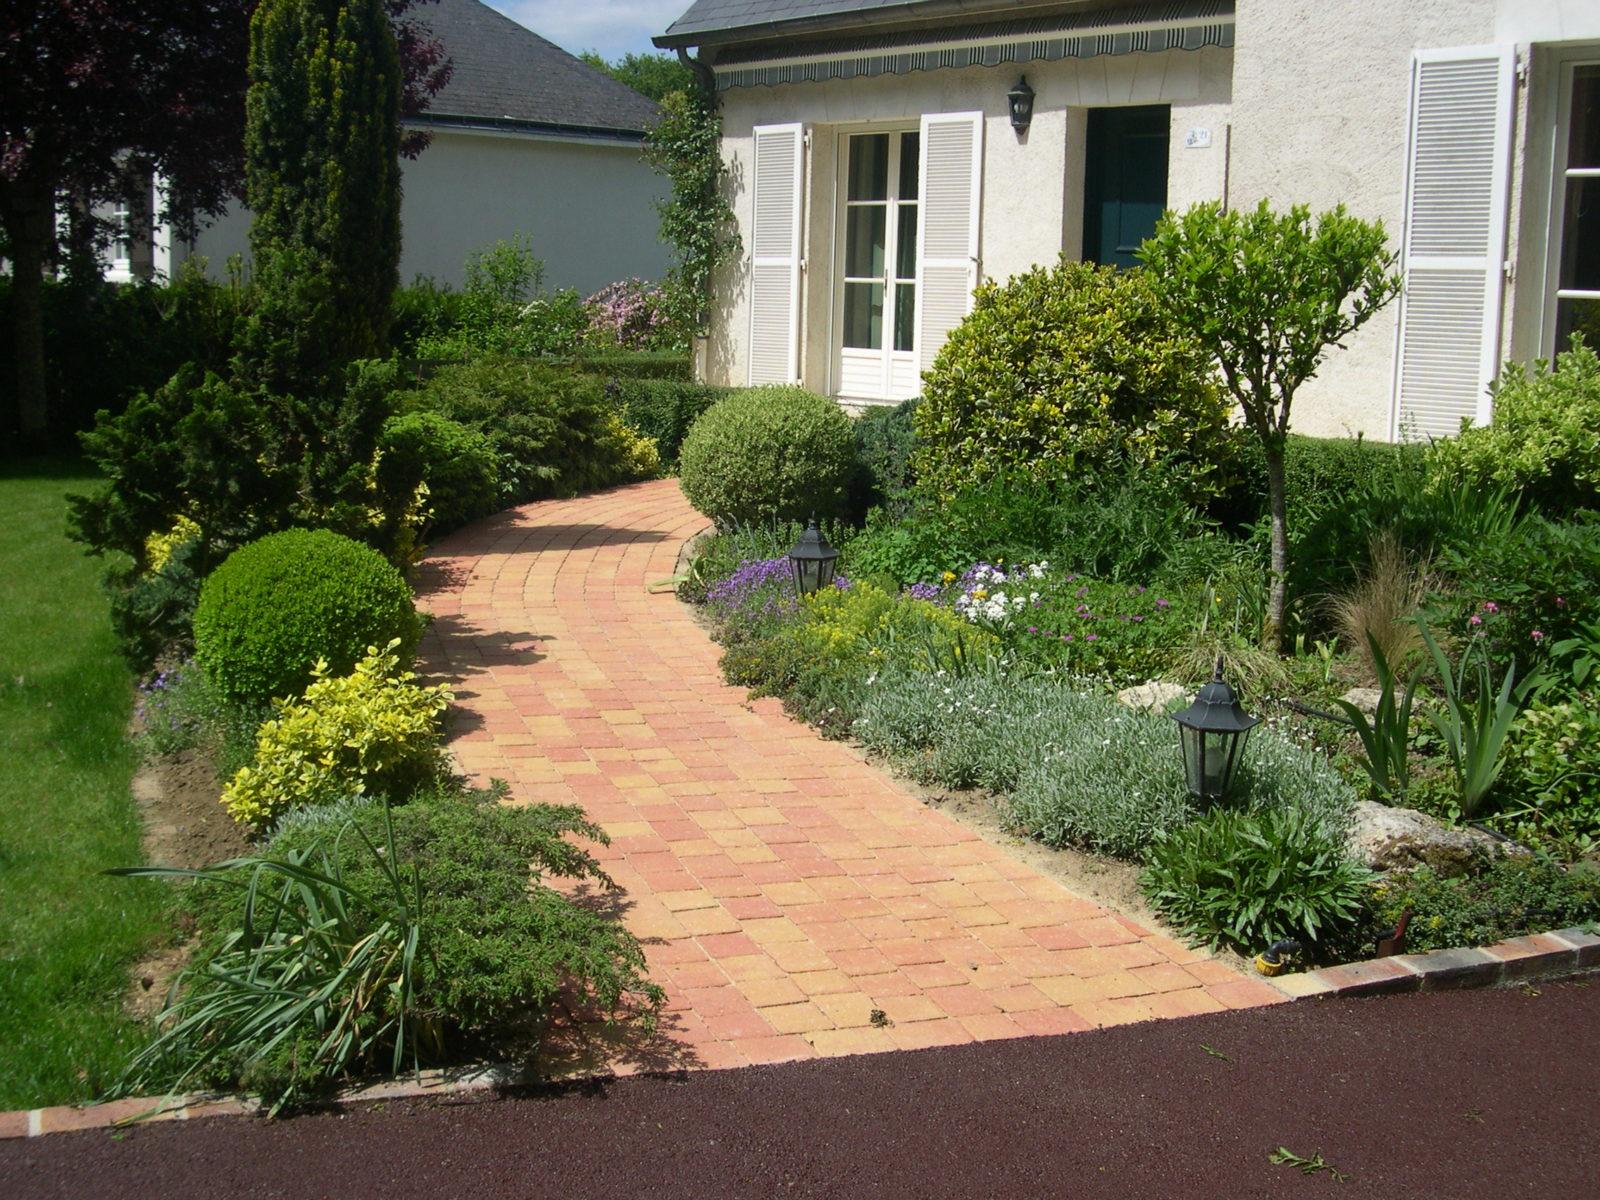 Aménagement D'allée Extérieure (Maison, Jardin, Garage ... concernant Exemple D Aménagement De Jardin